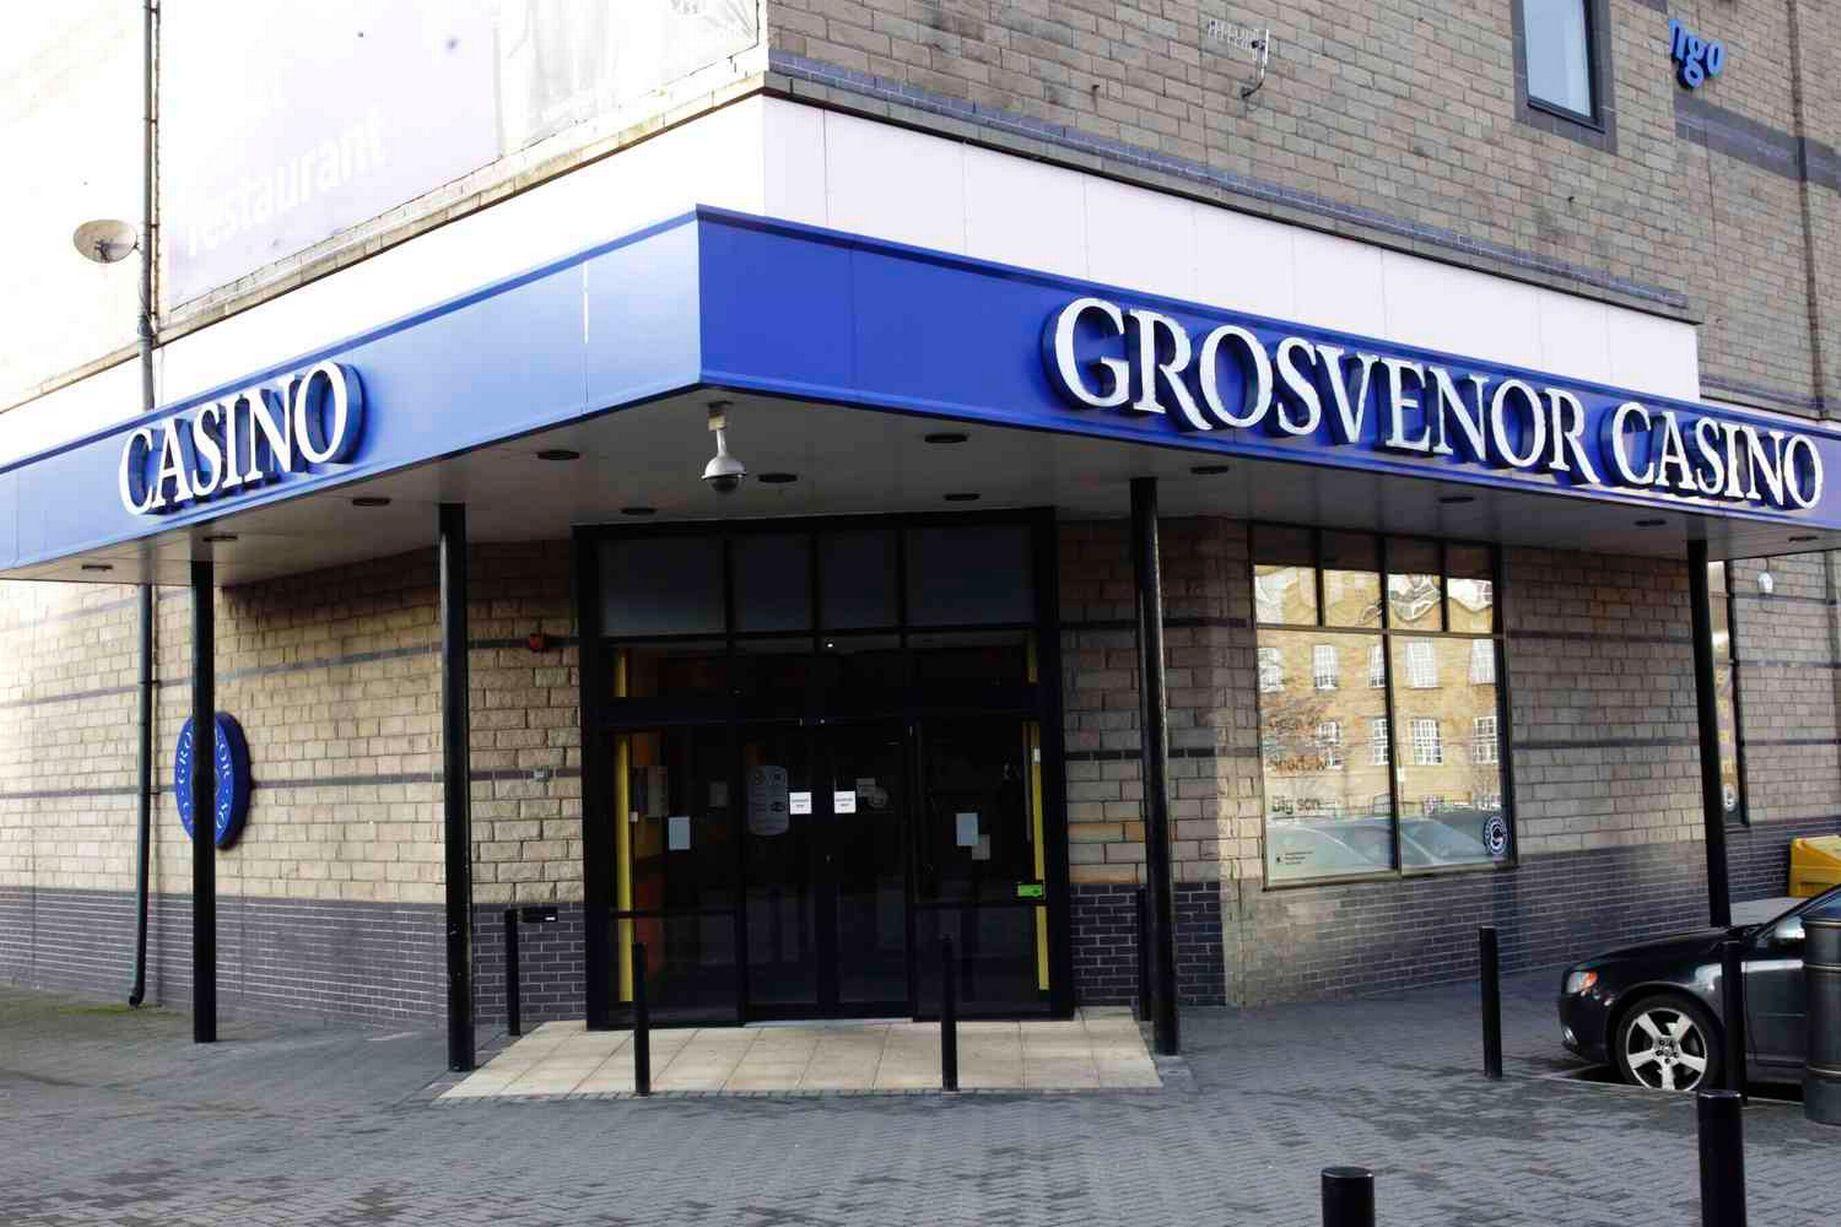 Grosvenor Casino Folly Hall screenshot 2